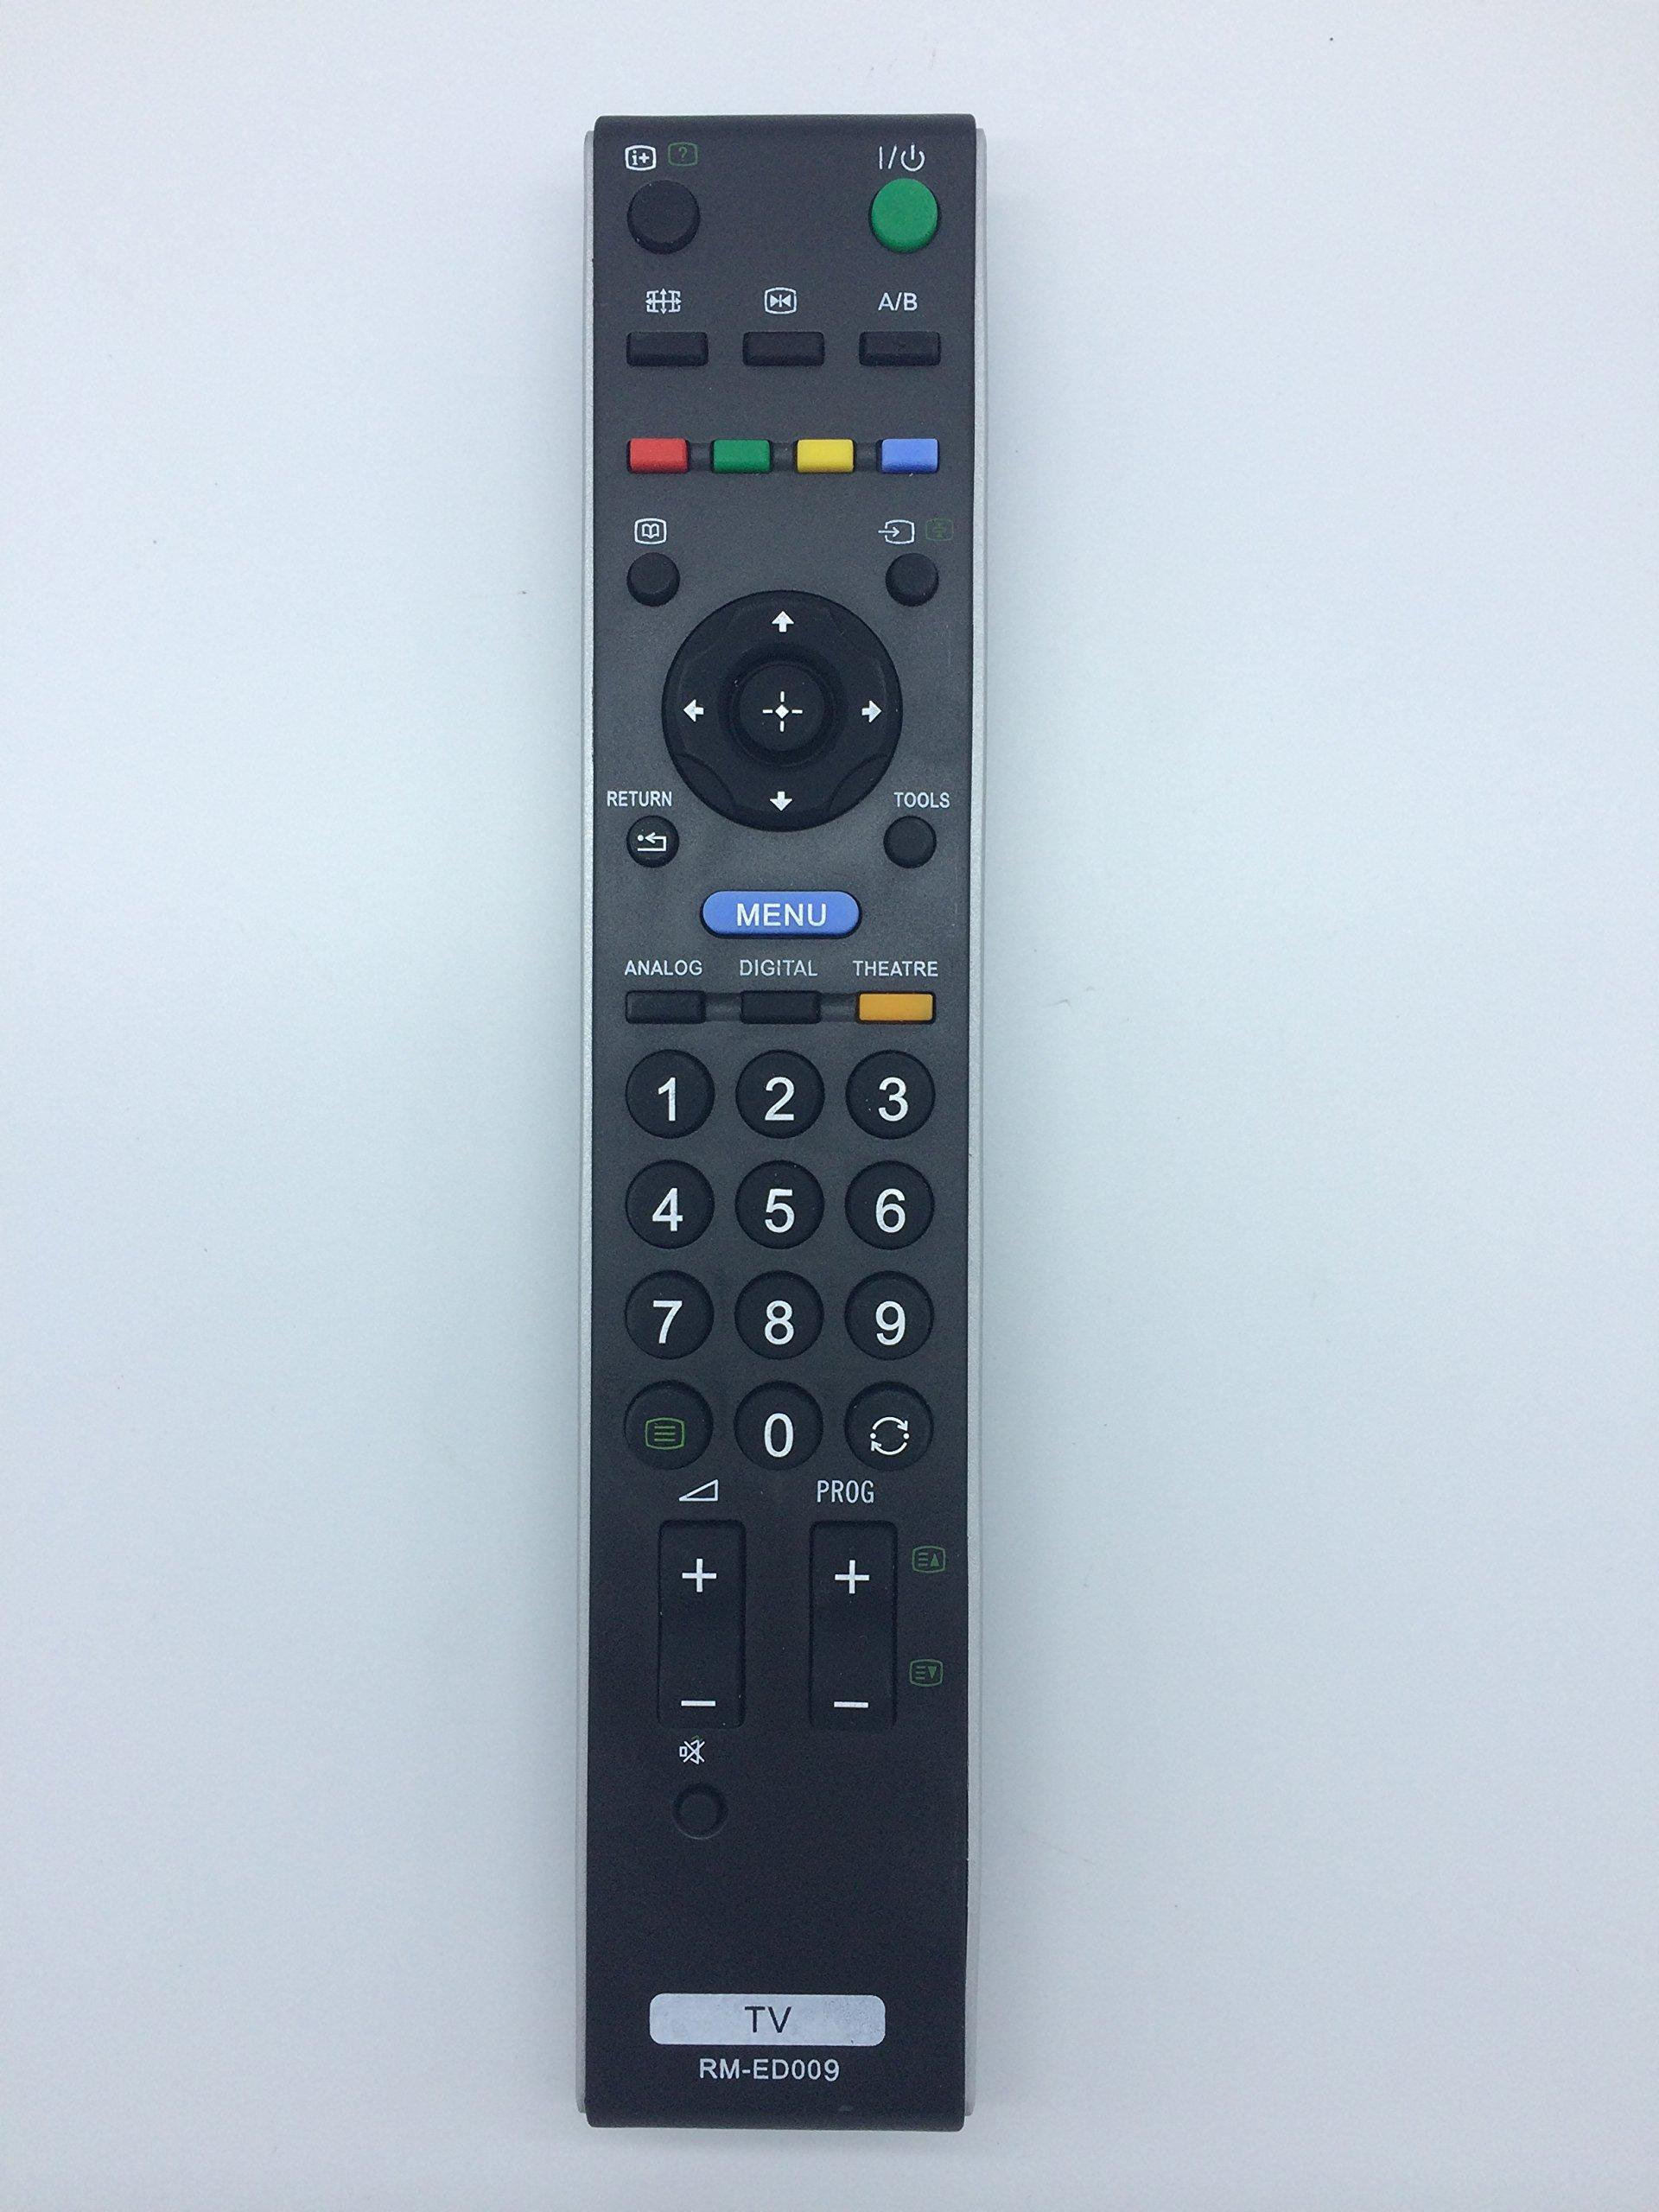 Vinabty para televisor mando a distancia RM ED009 compatible con Sony KDL32S2030UKA KDL32S2510 KDL32S2510E KDL32S2520 KDL32S2520E KDL32S2530 KDL32S2530E KDL32S2800 KDL32S2810 KDL32S2820 KDL32S3000: Amazon.es: Electrónica